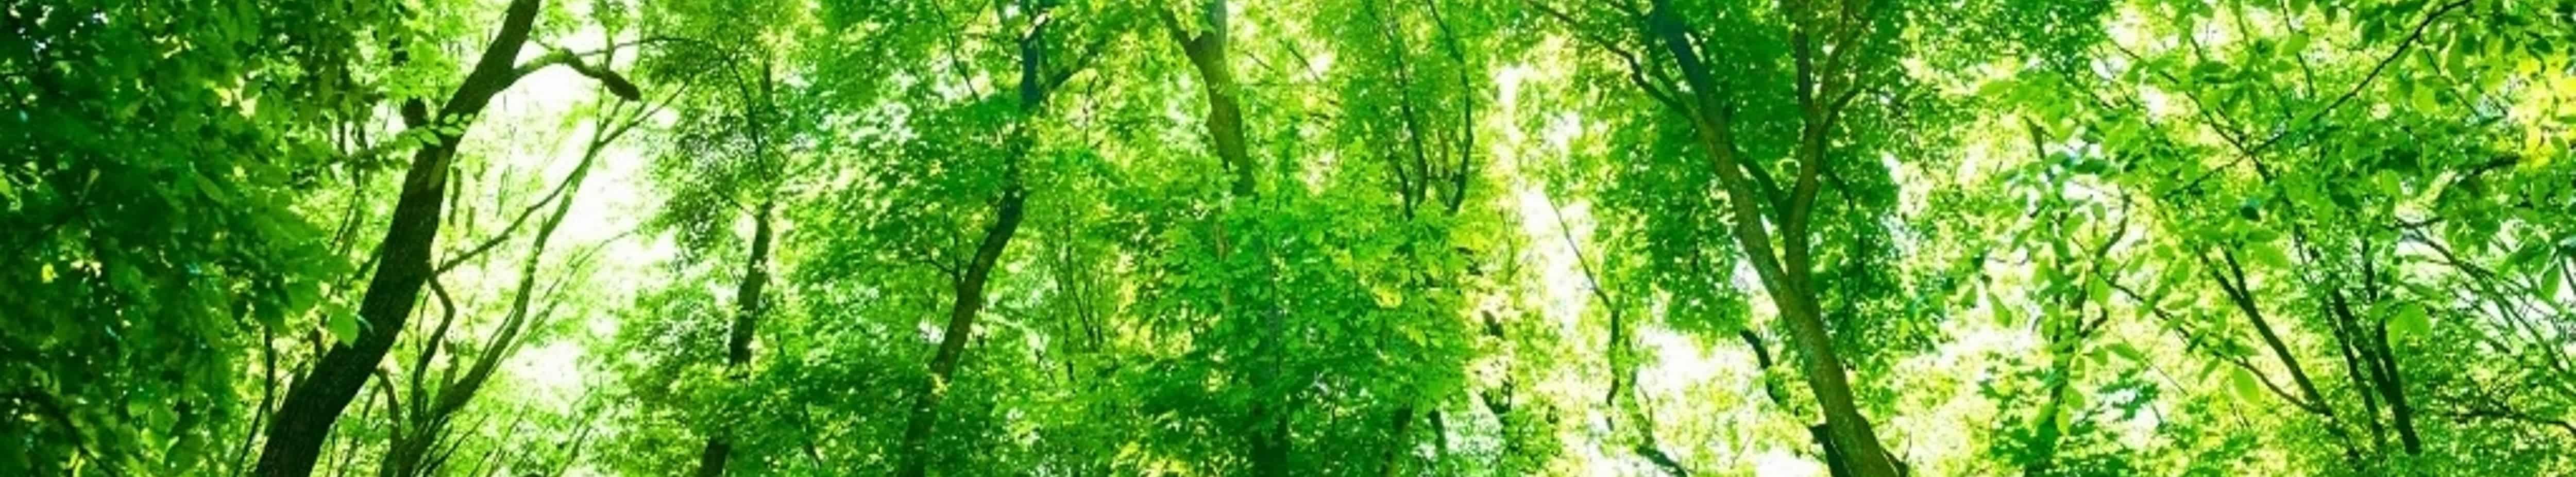 bg_trees_gorman-cropped 3